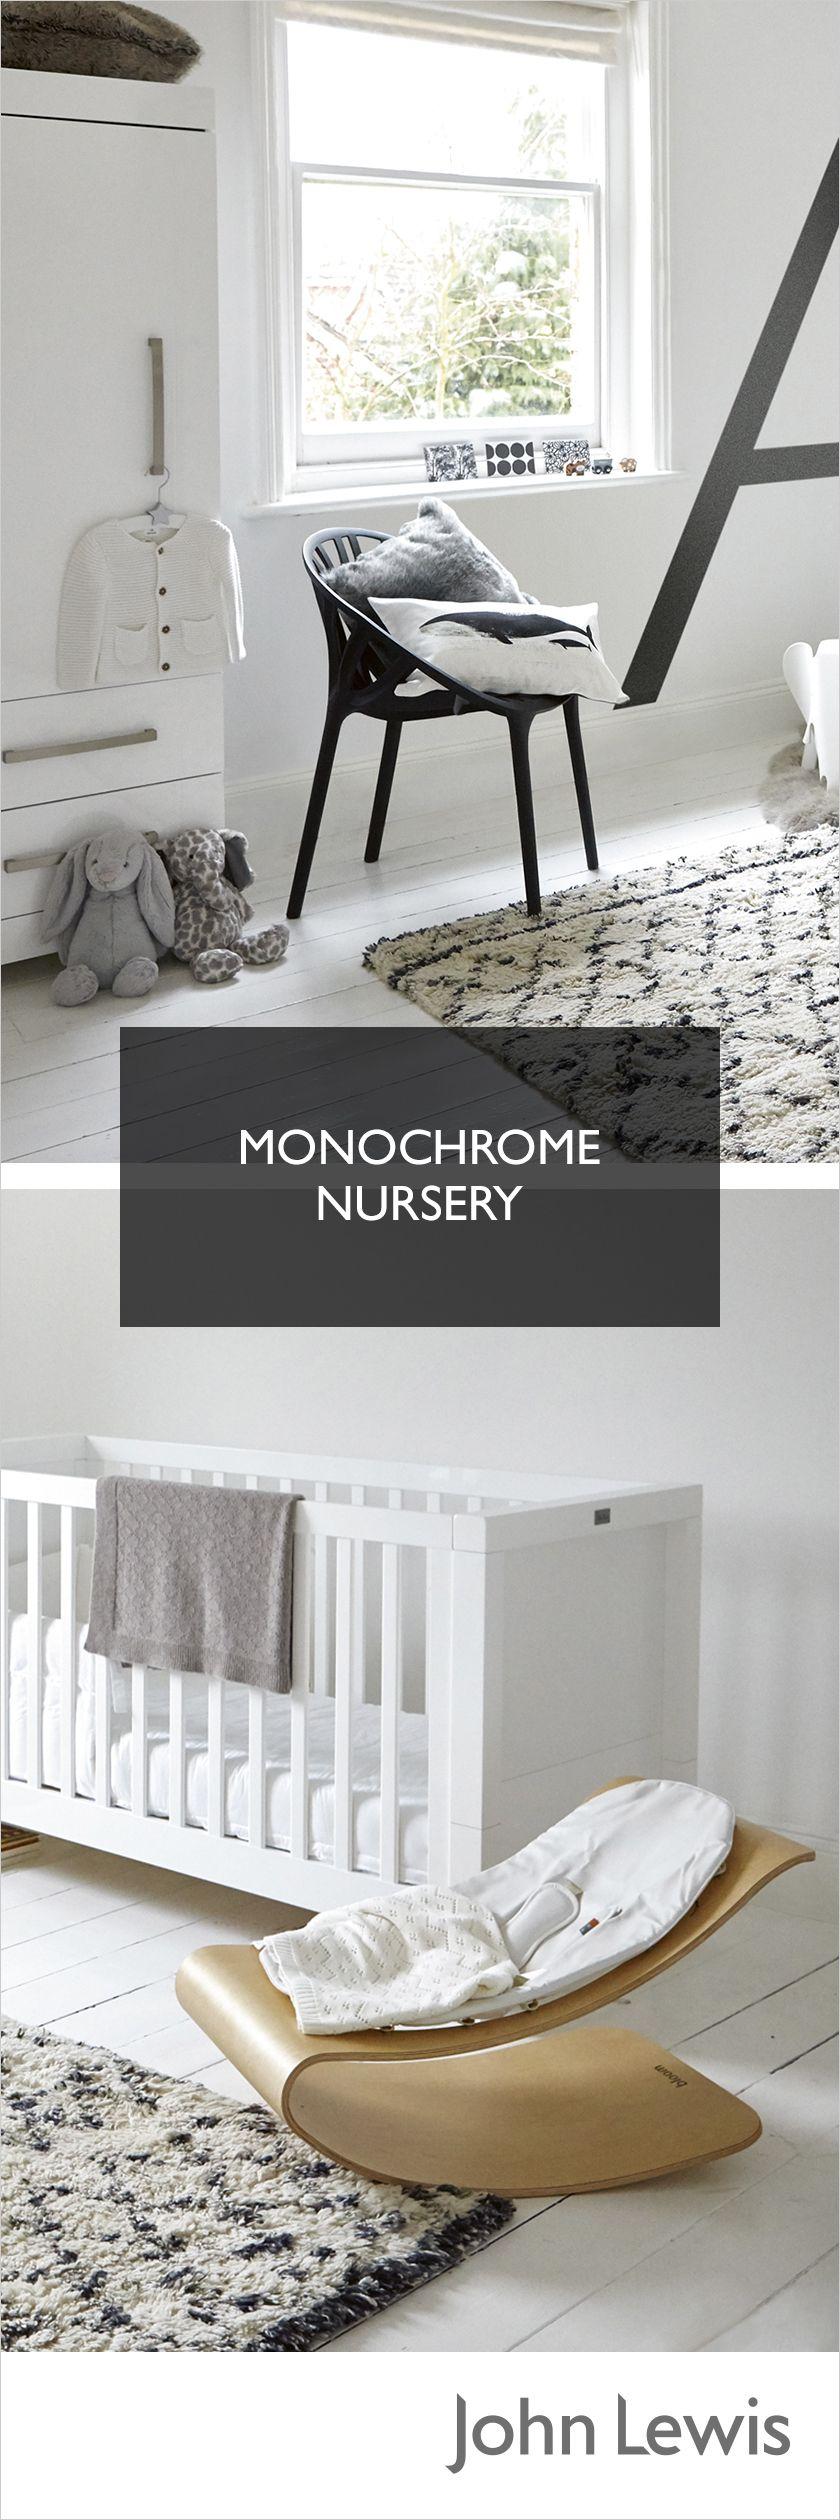 A modern monochrome nursery theme never dates keep it simple with